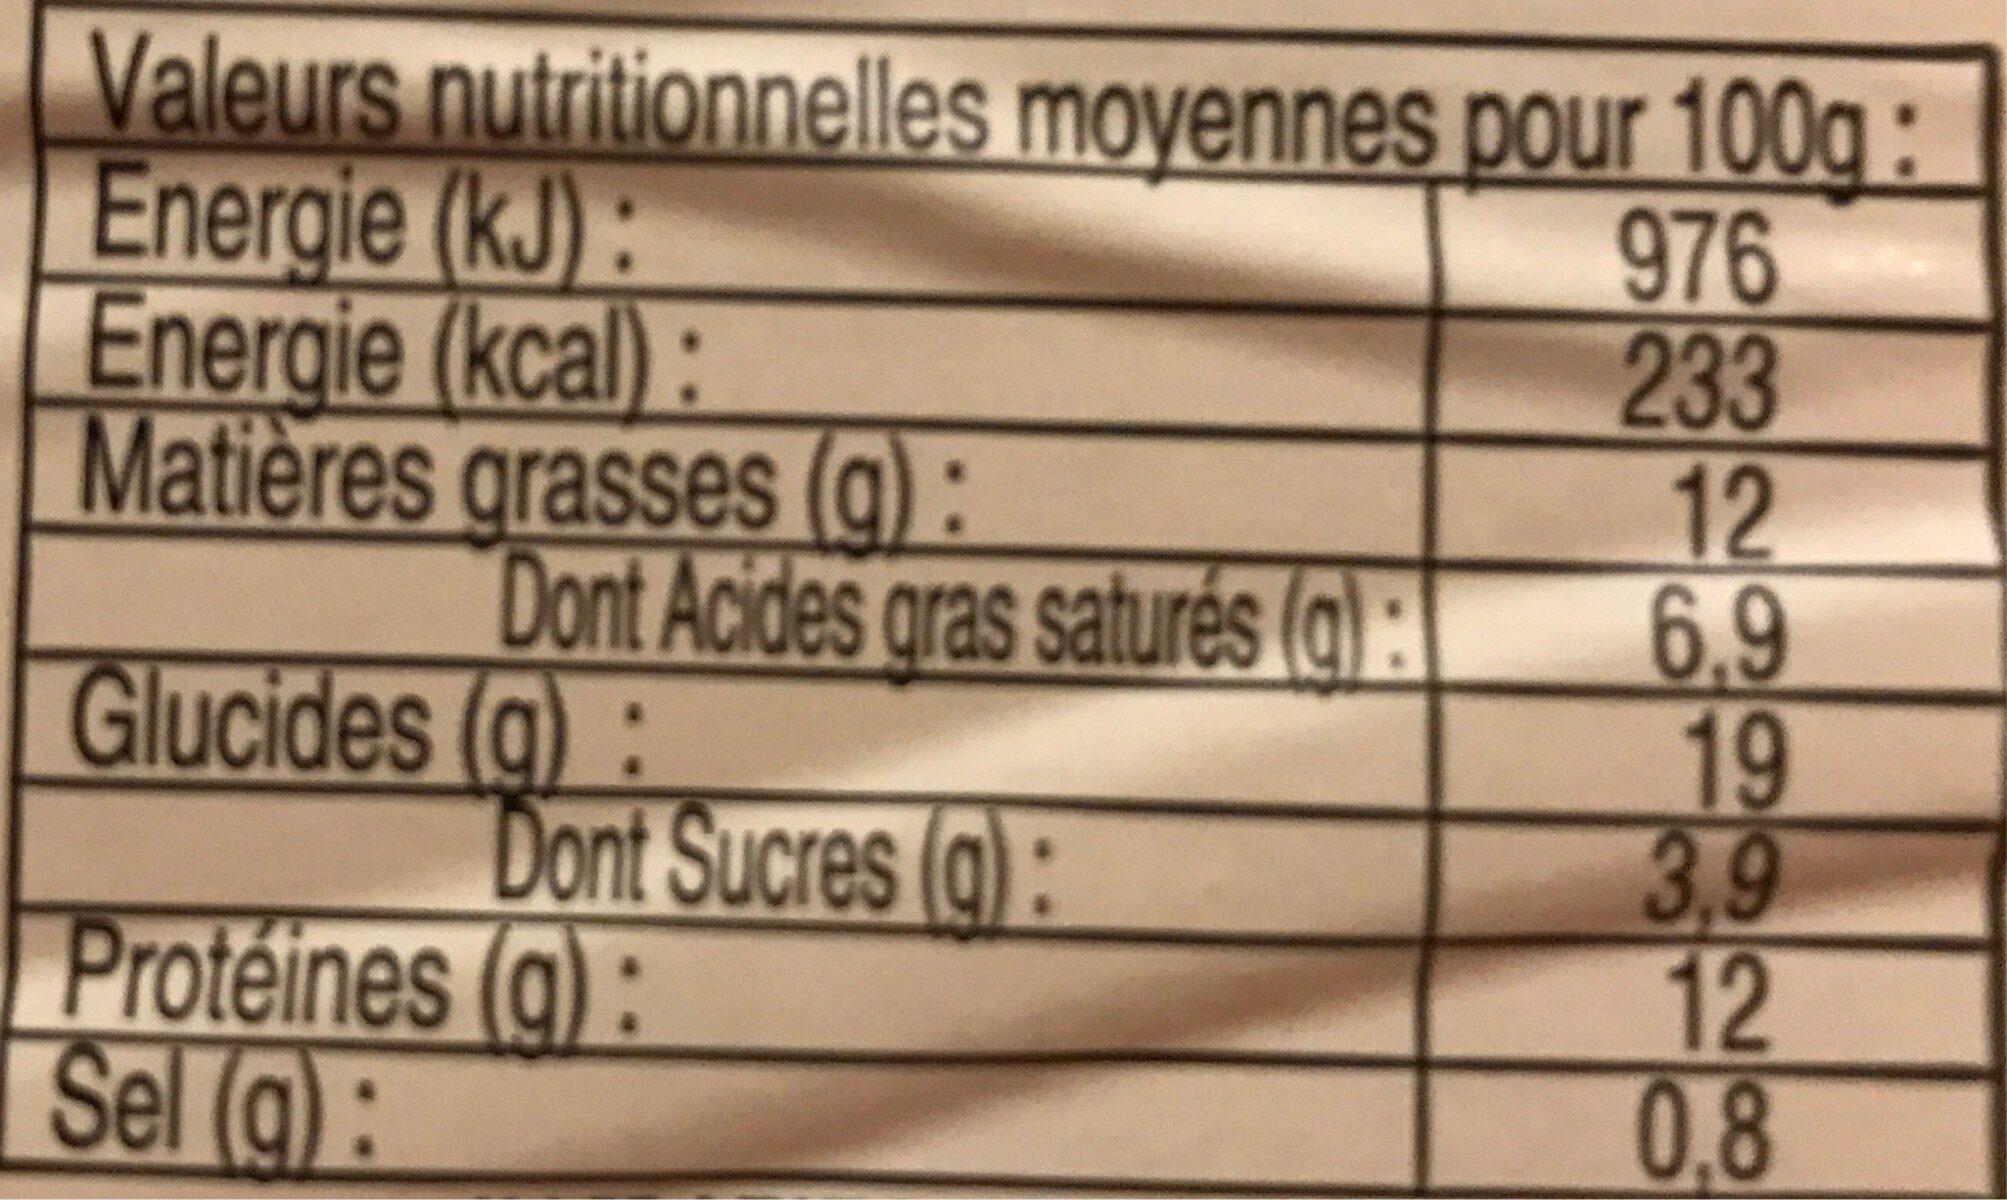 2 crêpes de froment Jambon Emmental - Informations nutritionnelles - fr